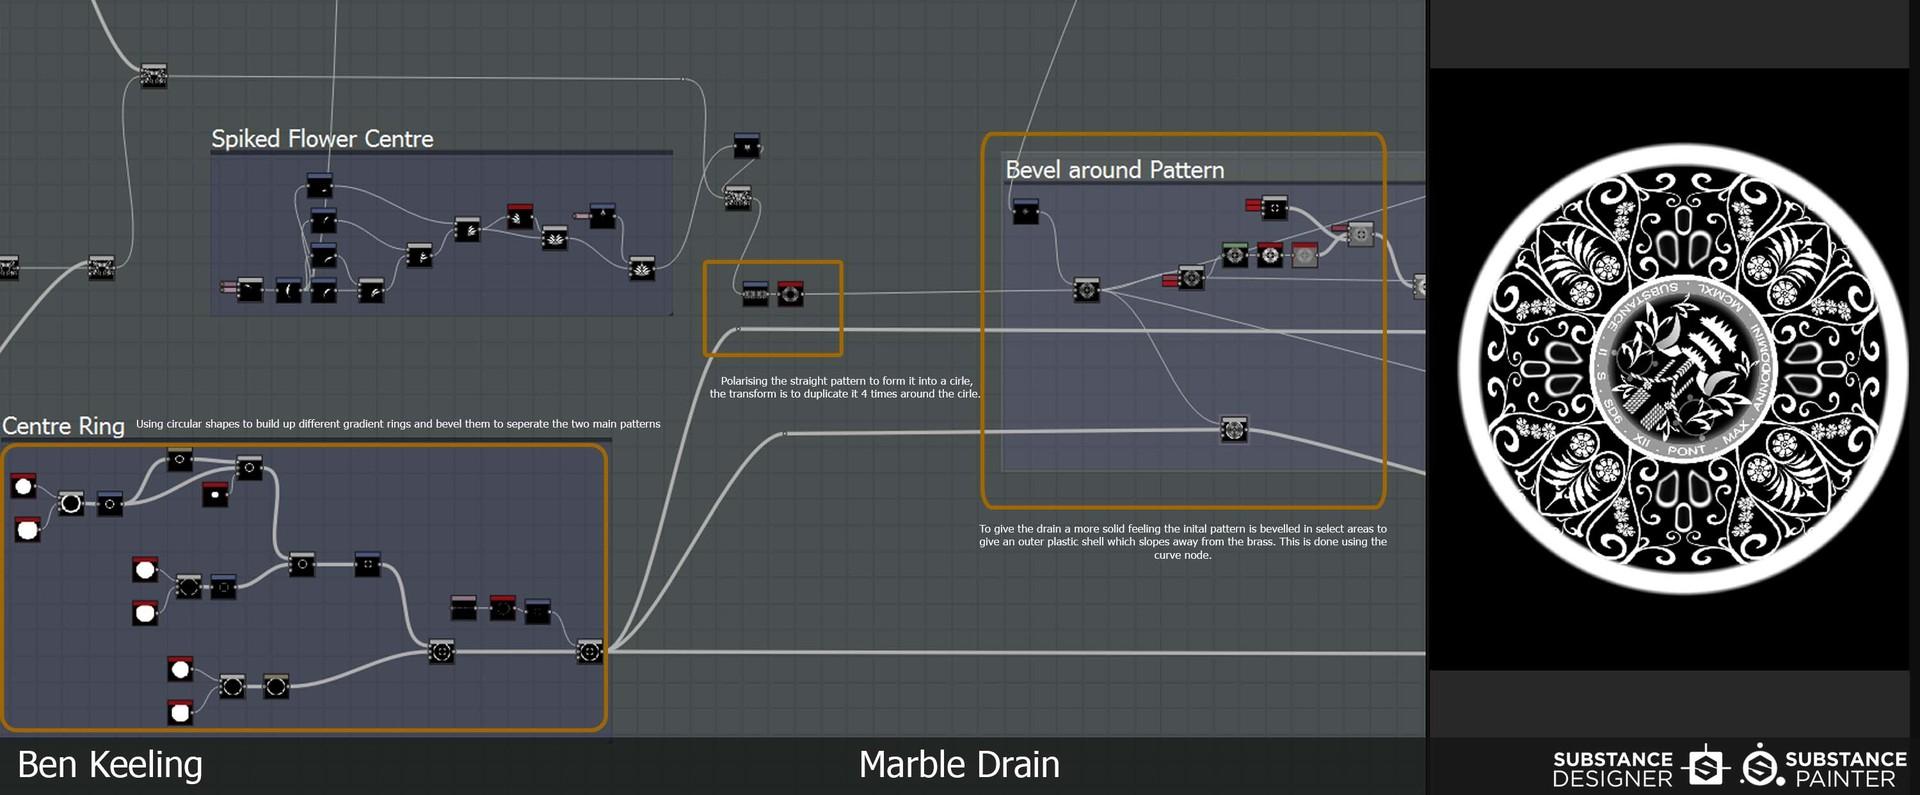 Ben keeling ep marbledrain render graphbreakdown2